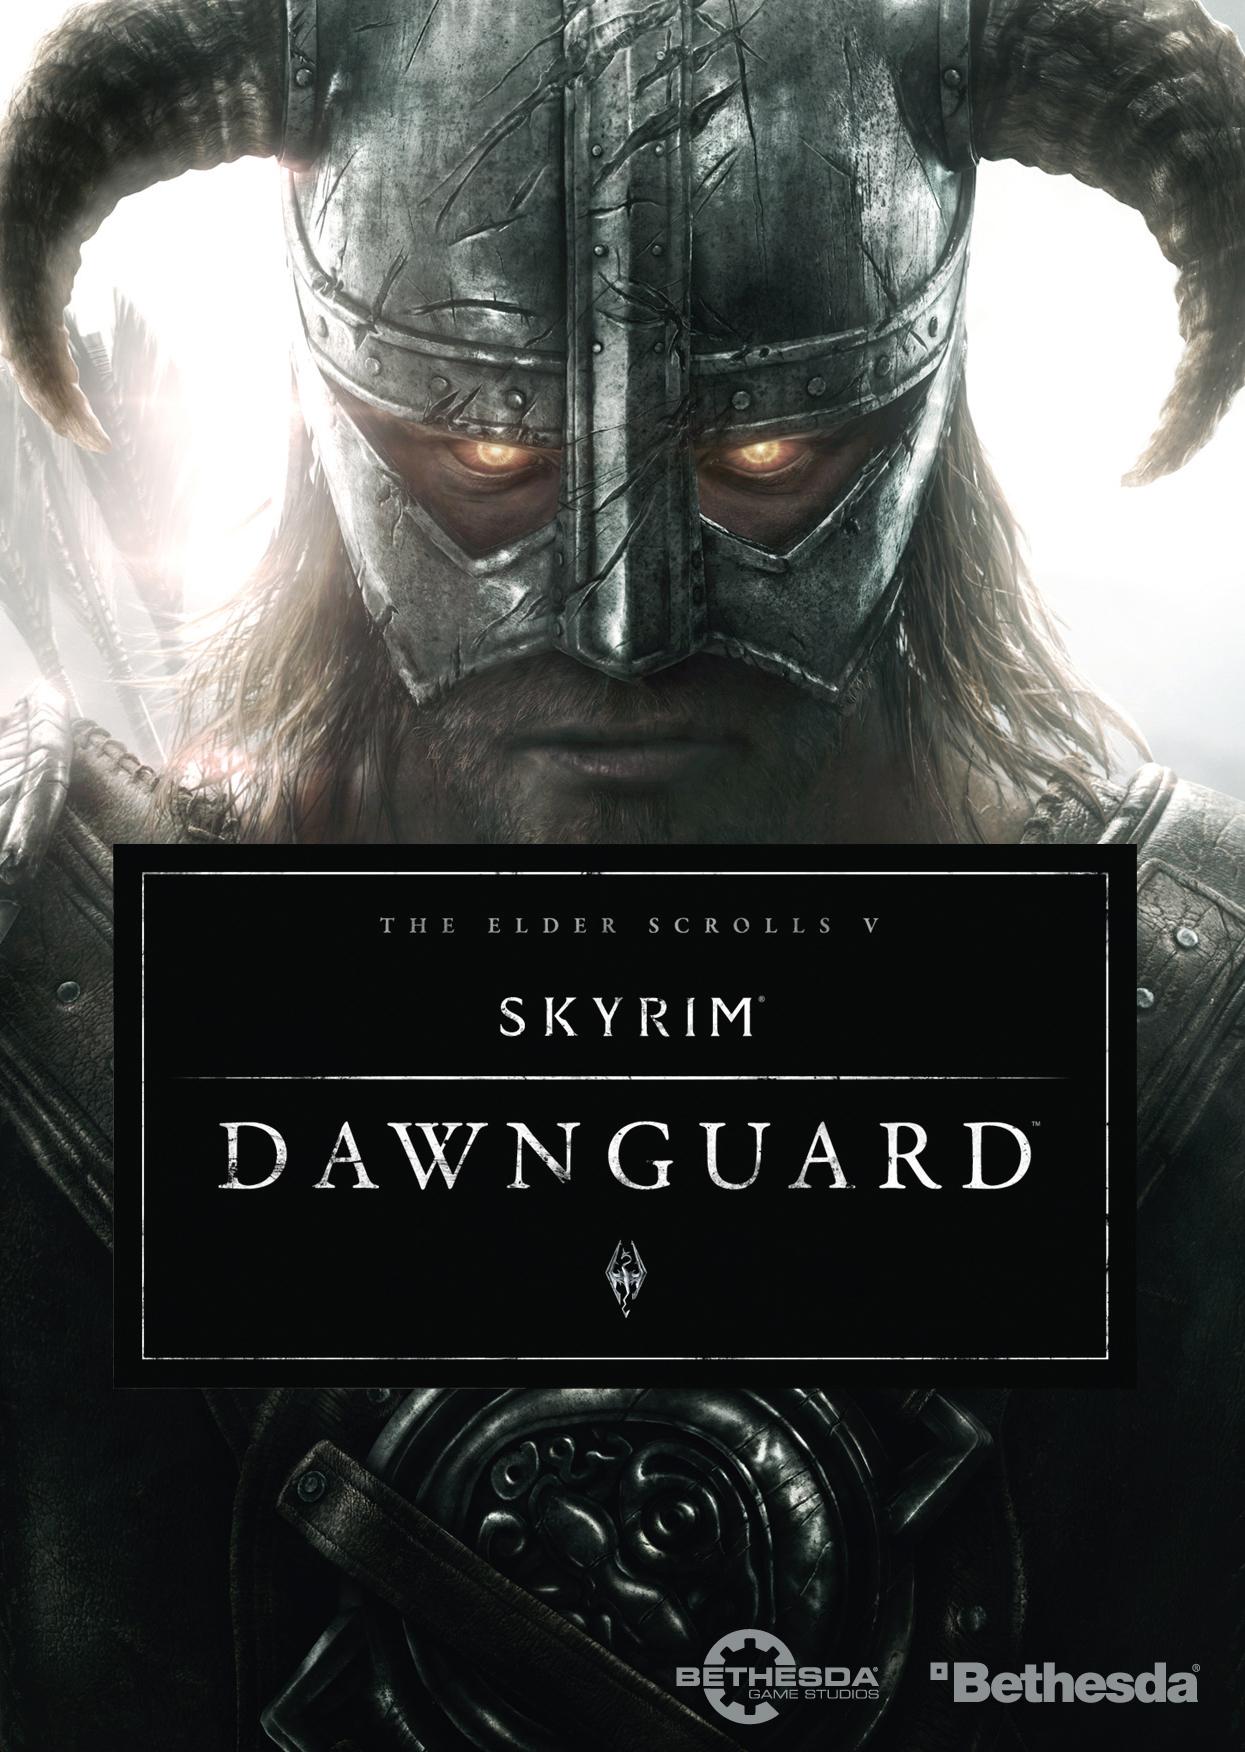 Skyrim - Dawnguard DLC - 2012 700MB 2012 |PC| Poster